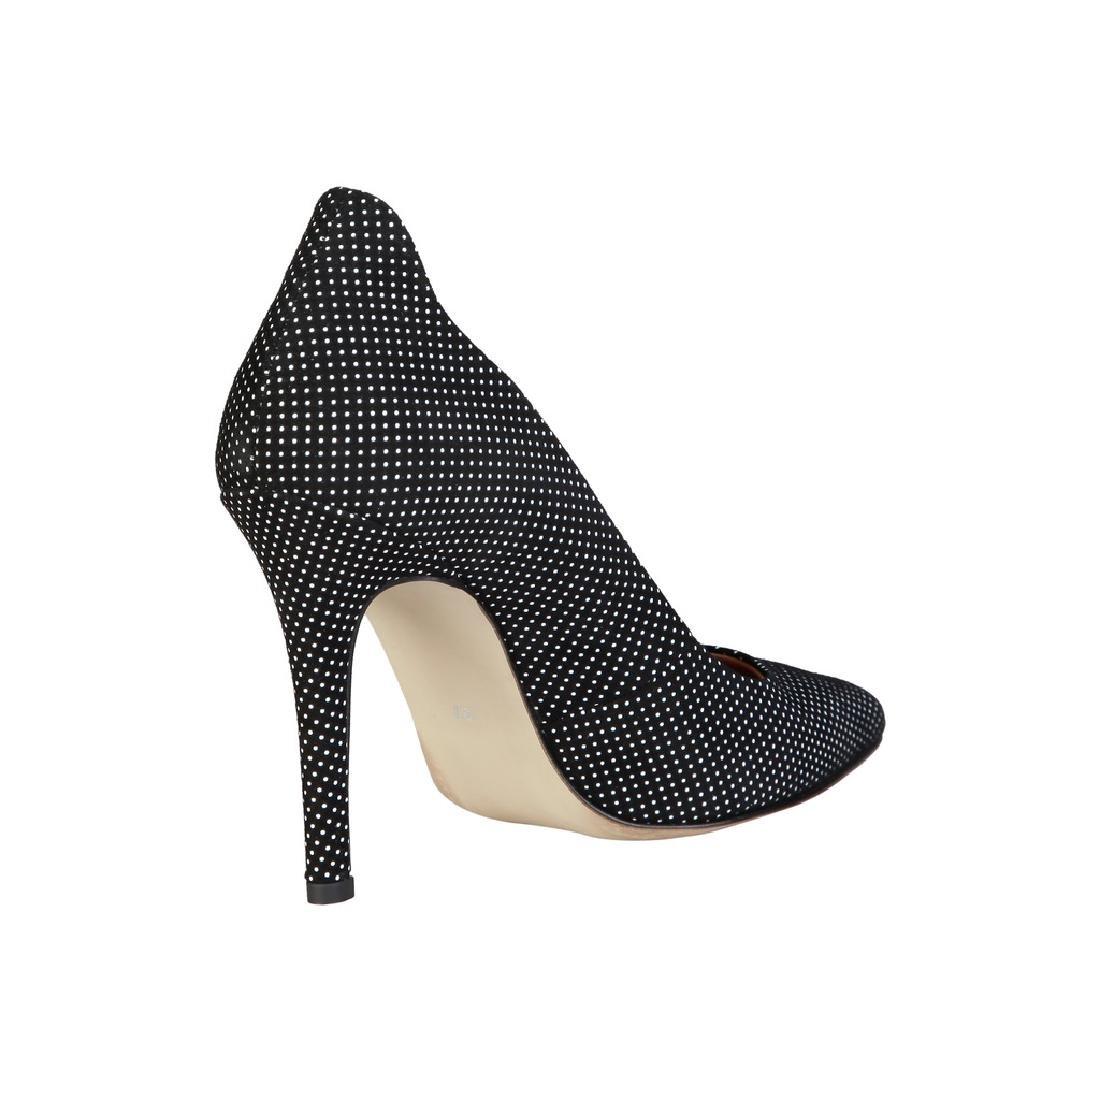 New Women's Pierre Cardin High Heel Pumps Shoes US 8.5 - 4